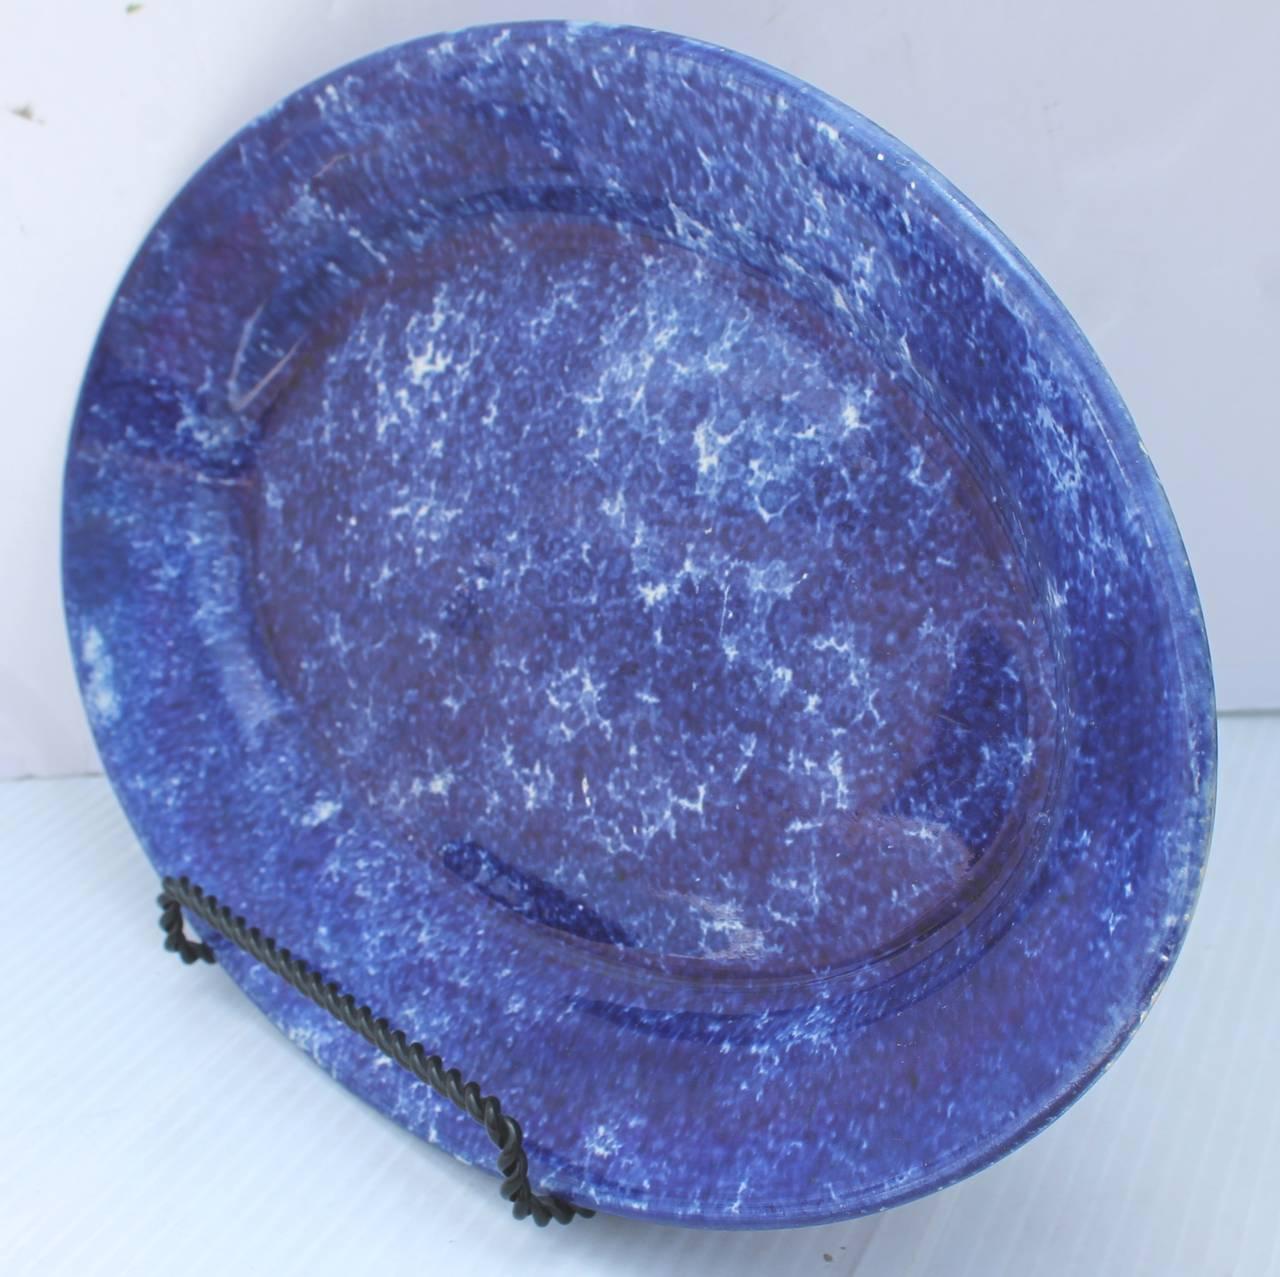 Wonderful 19th century deep blue sponge serving platter in pristine condition. The dark blue is fantastic.